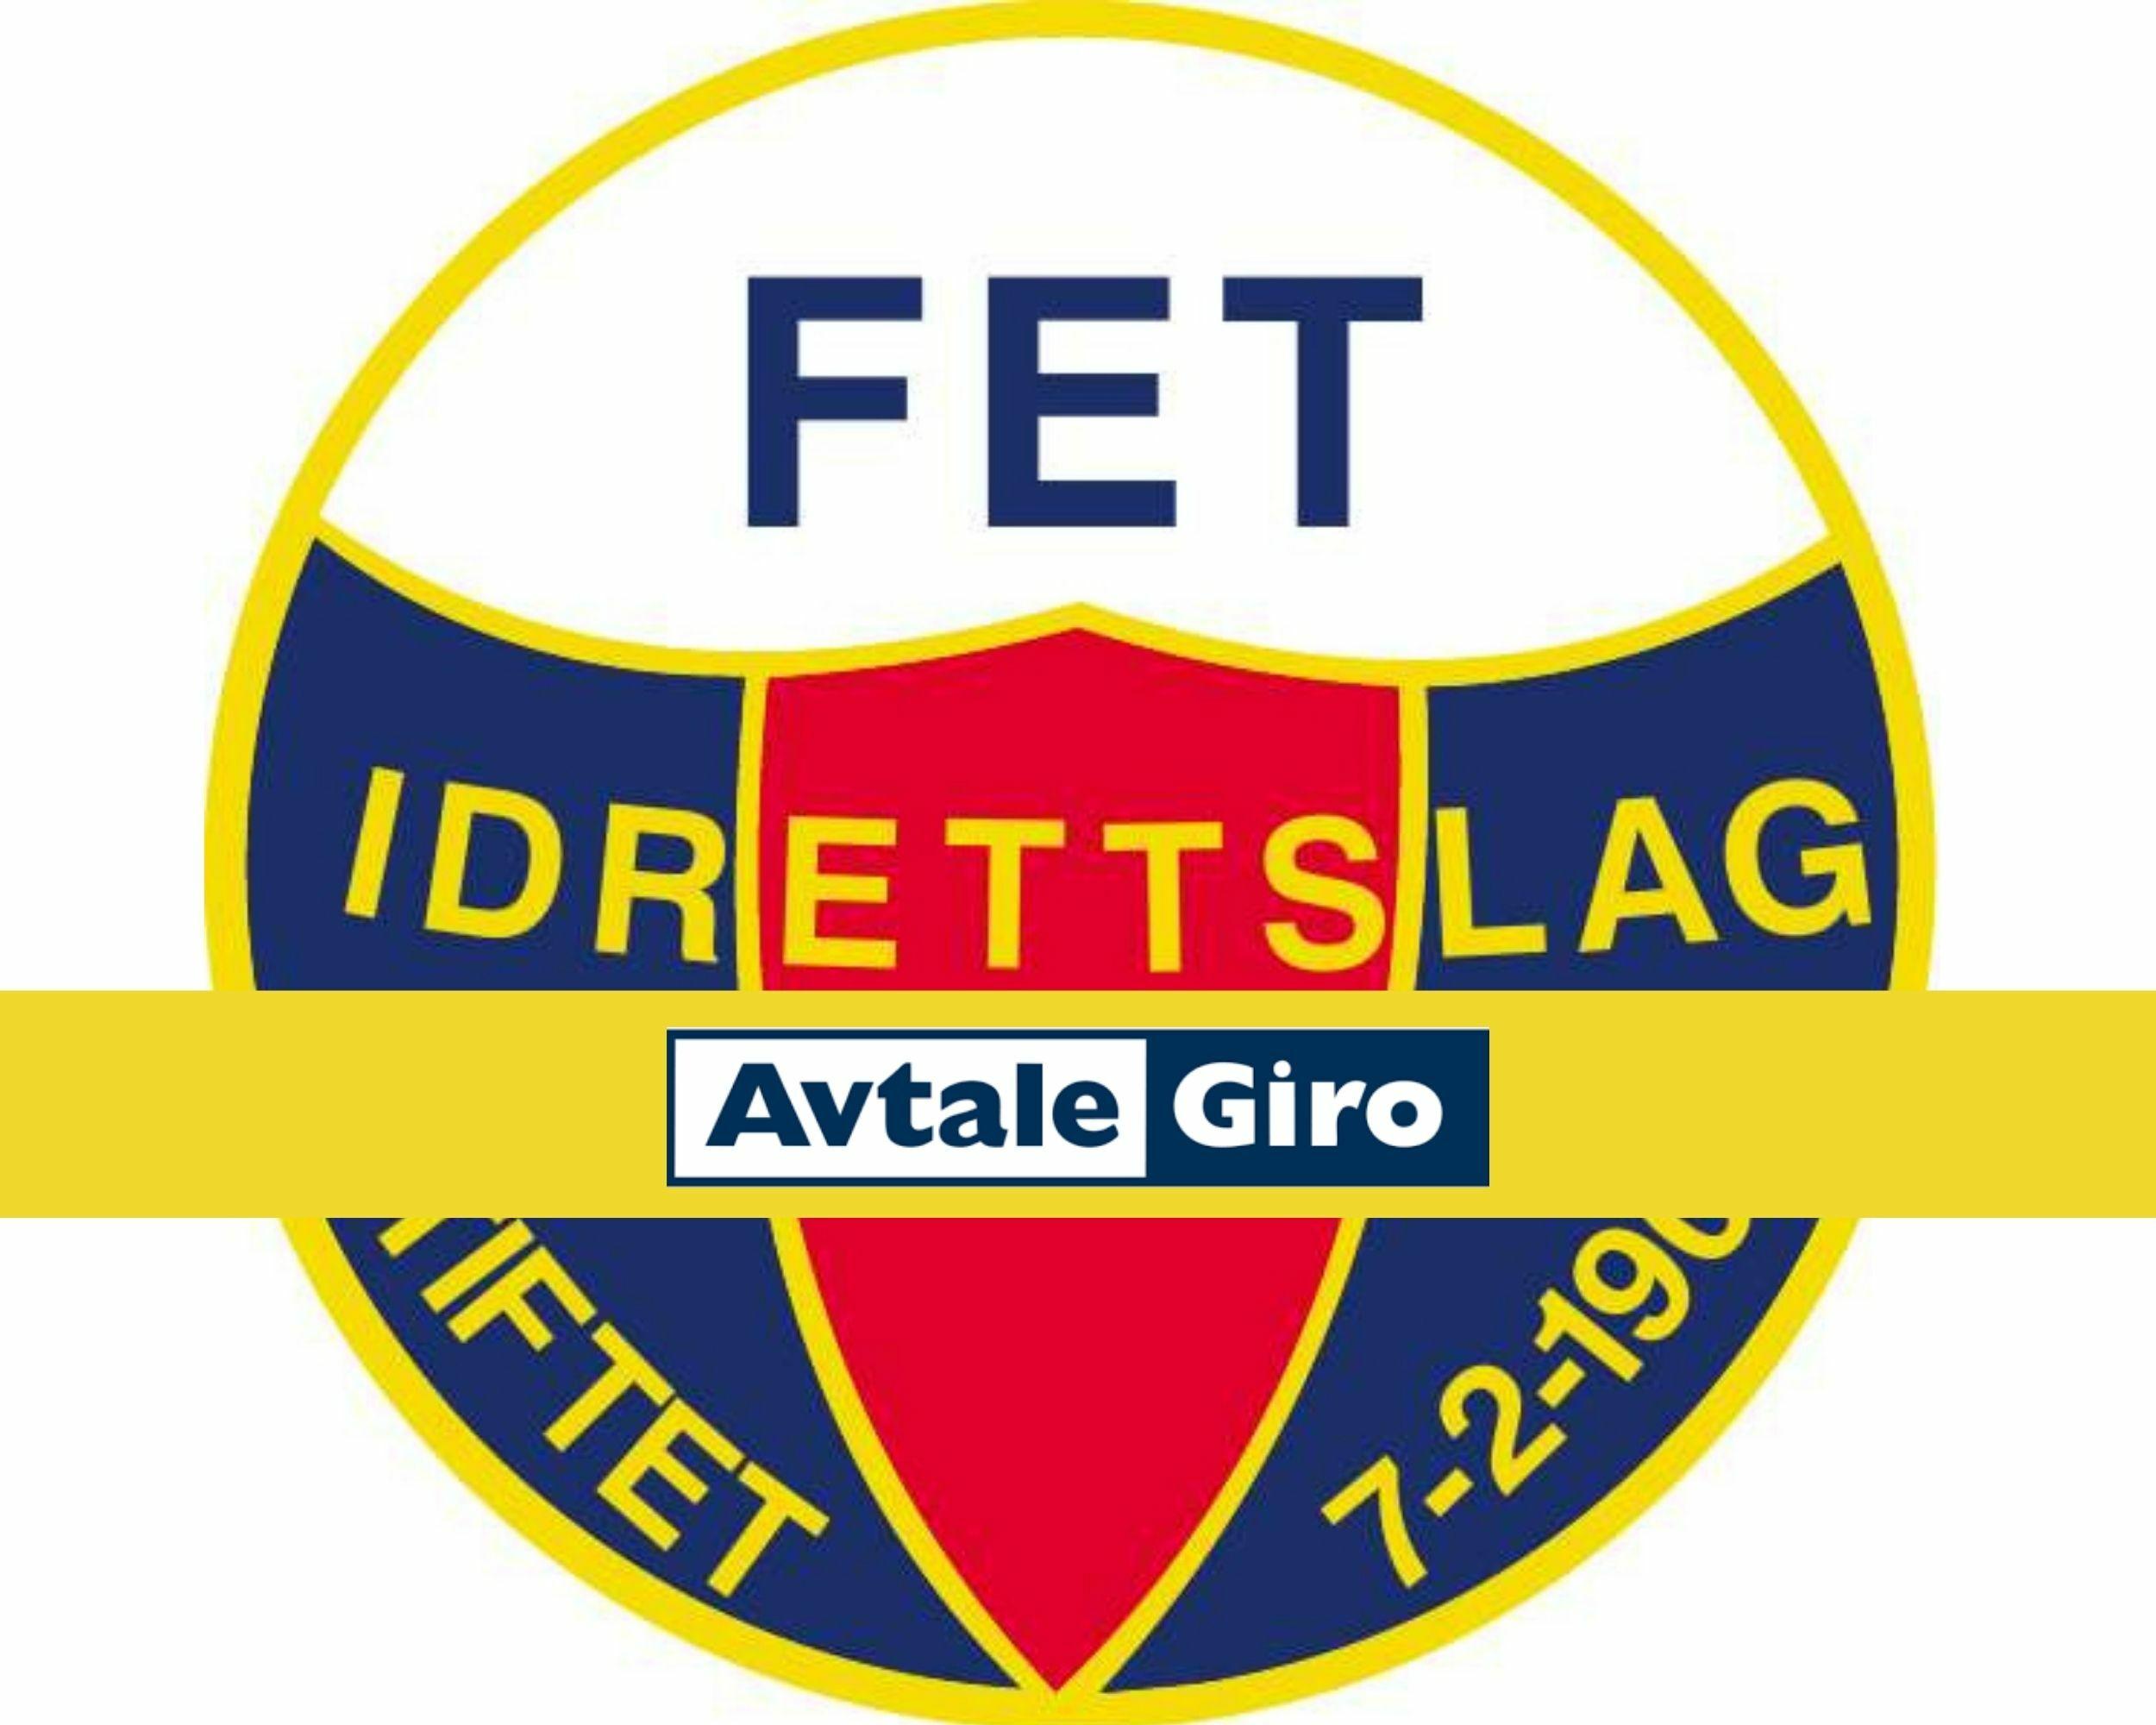 Logo Styrkerommet Eika Fet Arena